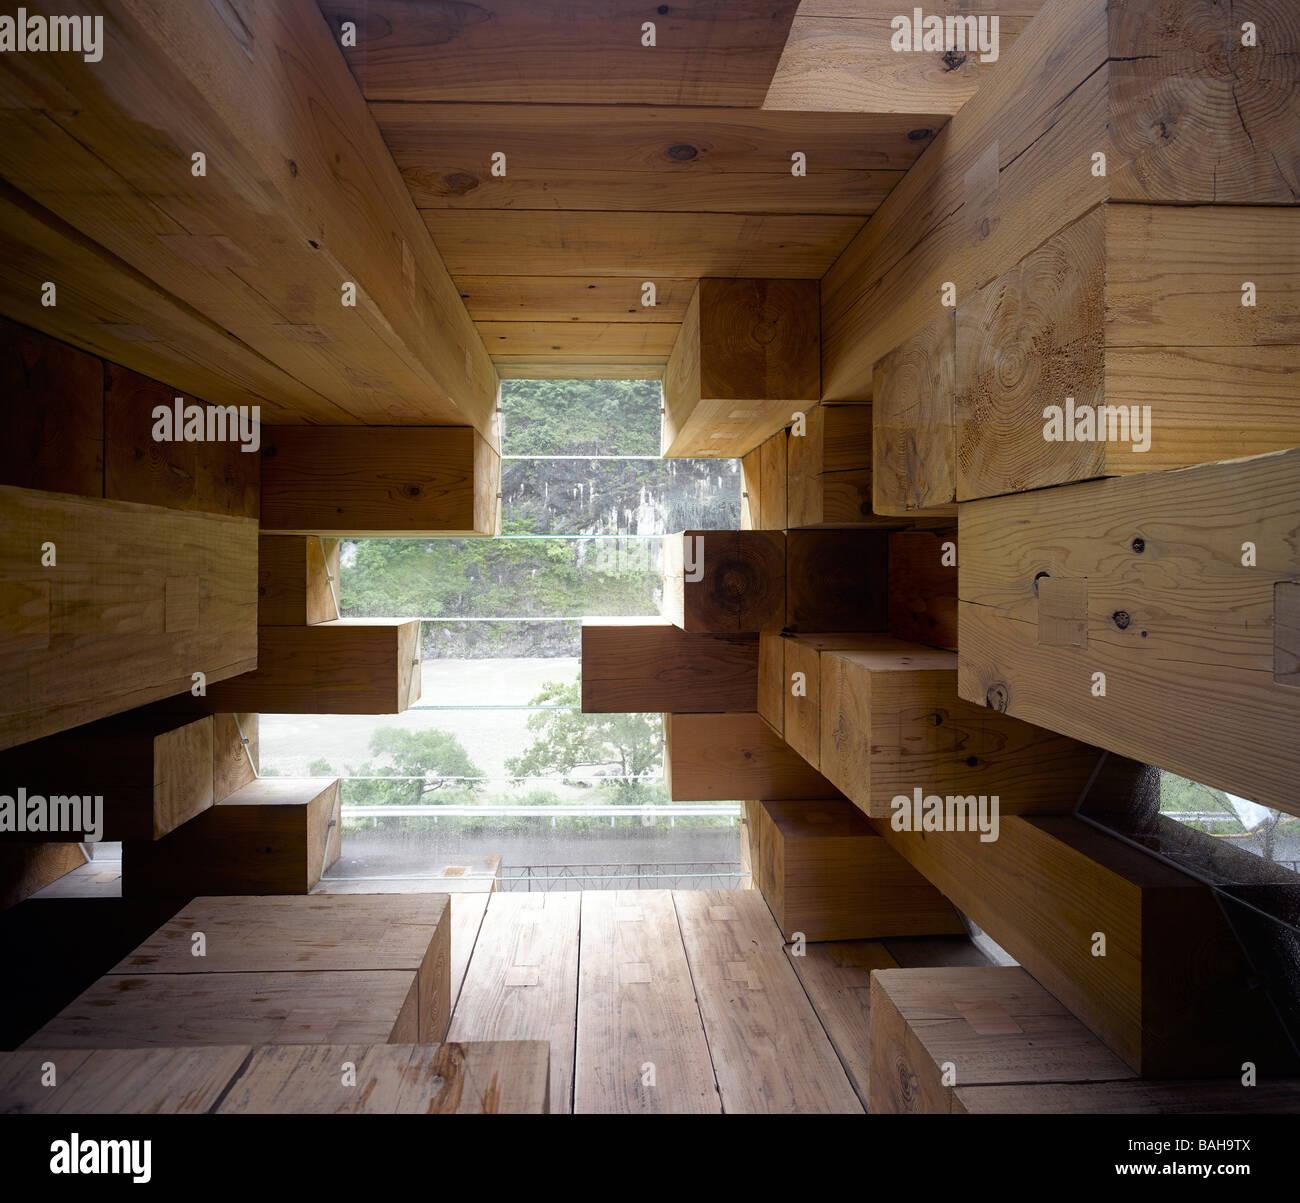 Final Wooden House, Kumamoto, Japan, Sou Fujimoto Architects, Final wooden house interior views. - Stock Image